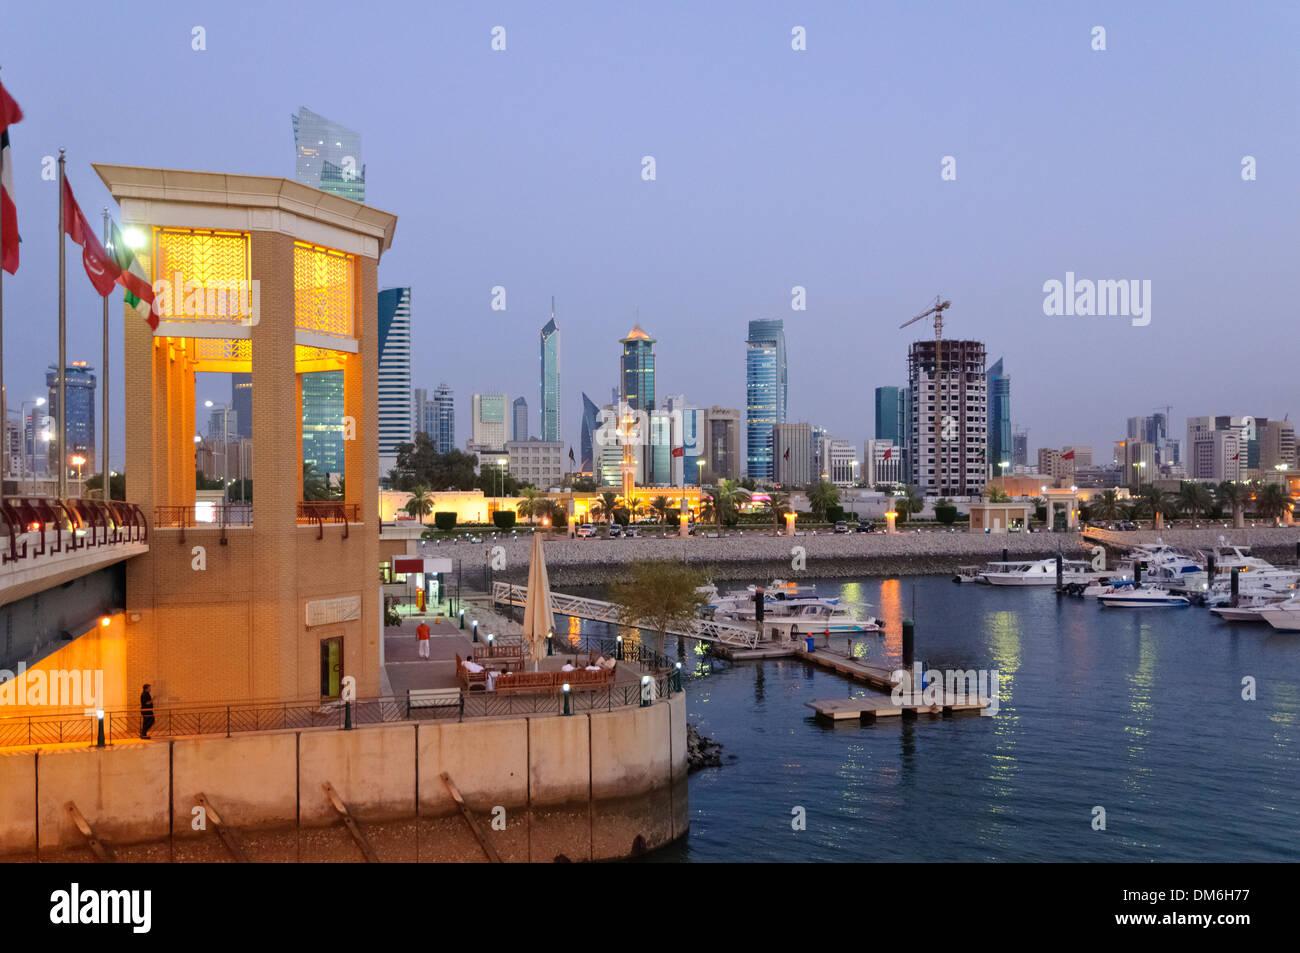 Sultan Mall with marina, Kuwait, Arabian pensinula, Western Asia - Stock Image